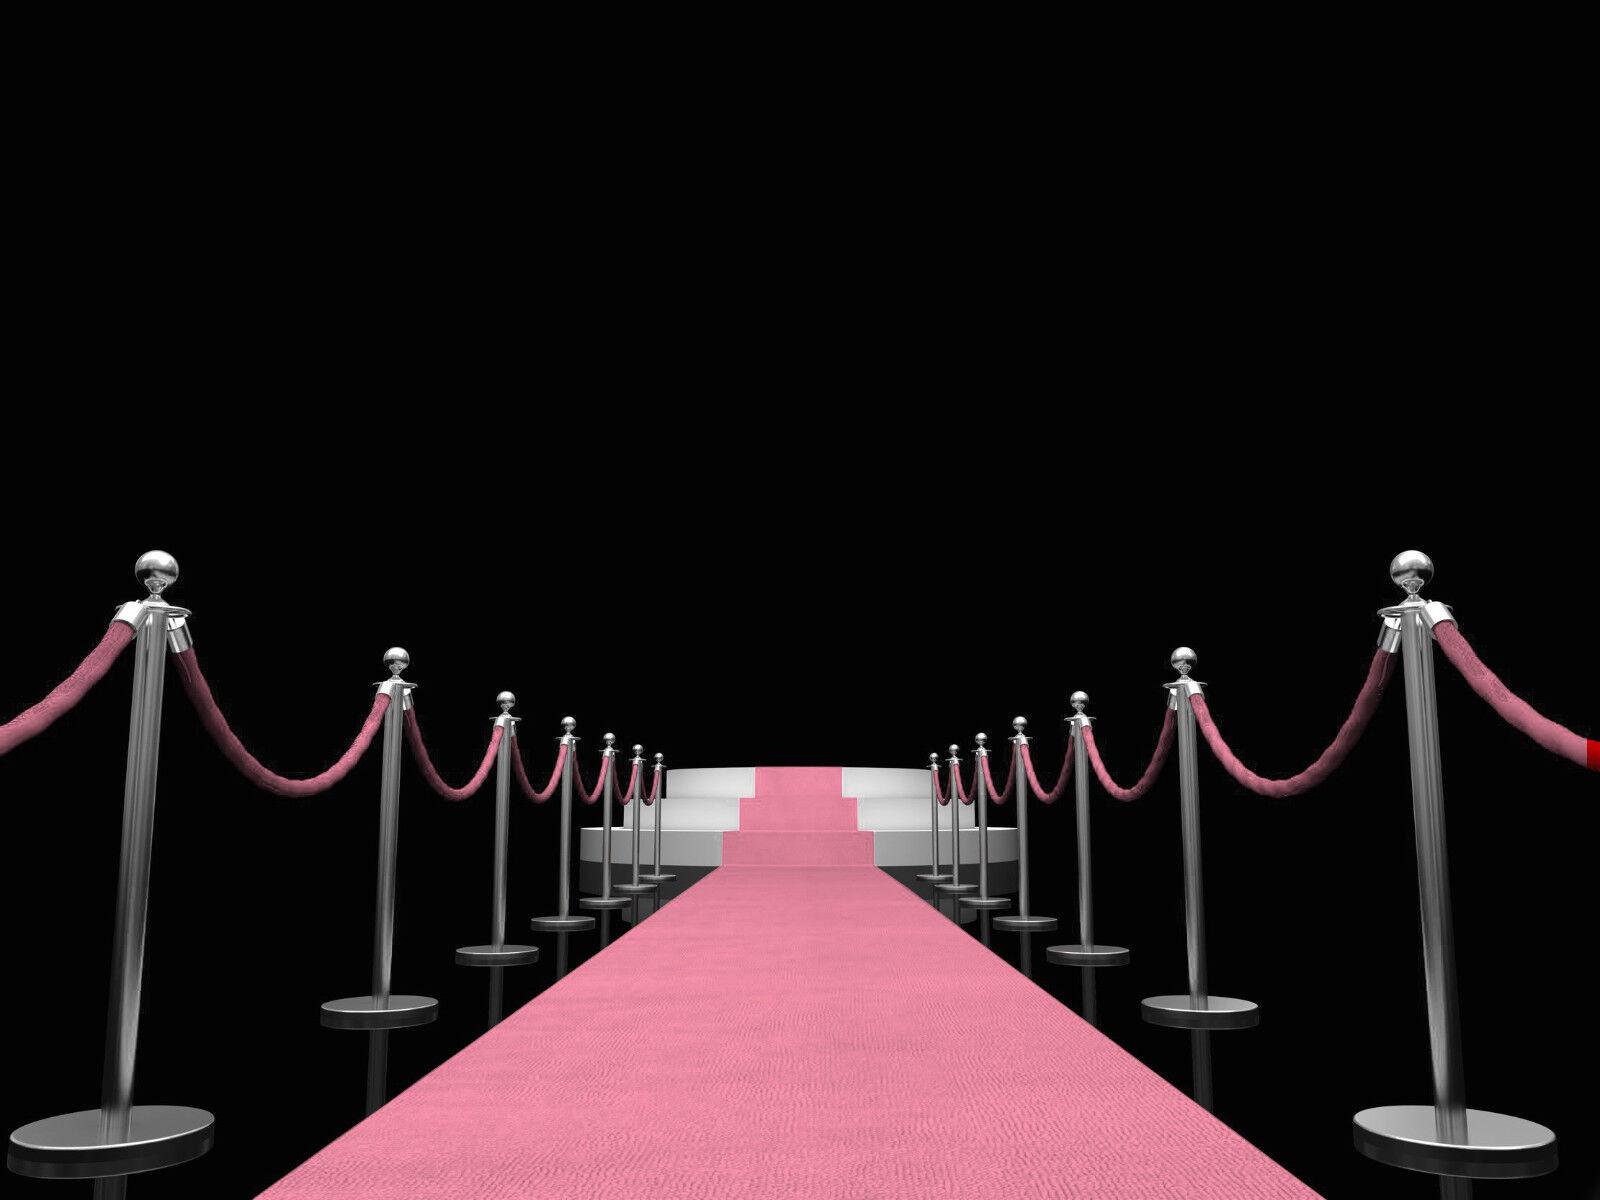 Läufer, Rosa Rosa Rosa Teppich, VIP Teppich, Empfangsteppich, Hochzeitsteppich ab 2,95 m² | Smart  cc0e81